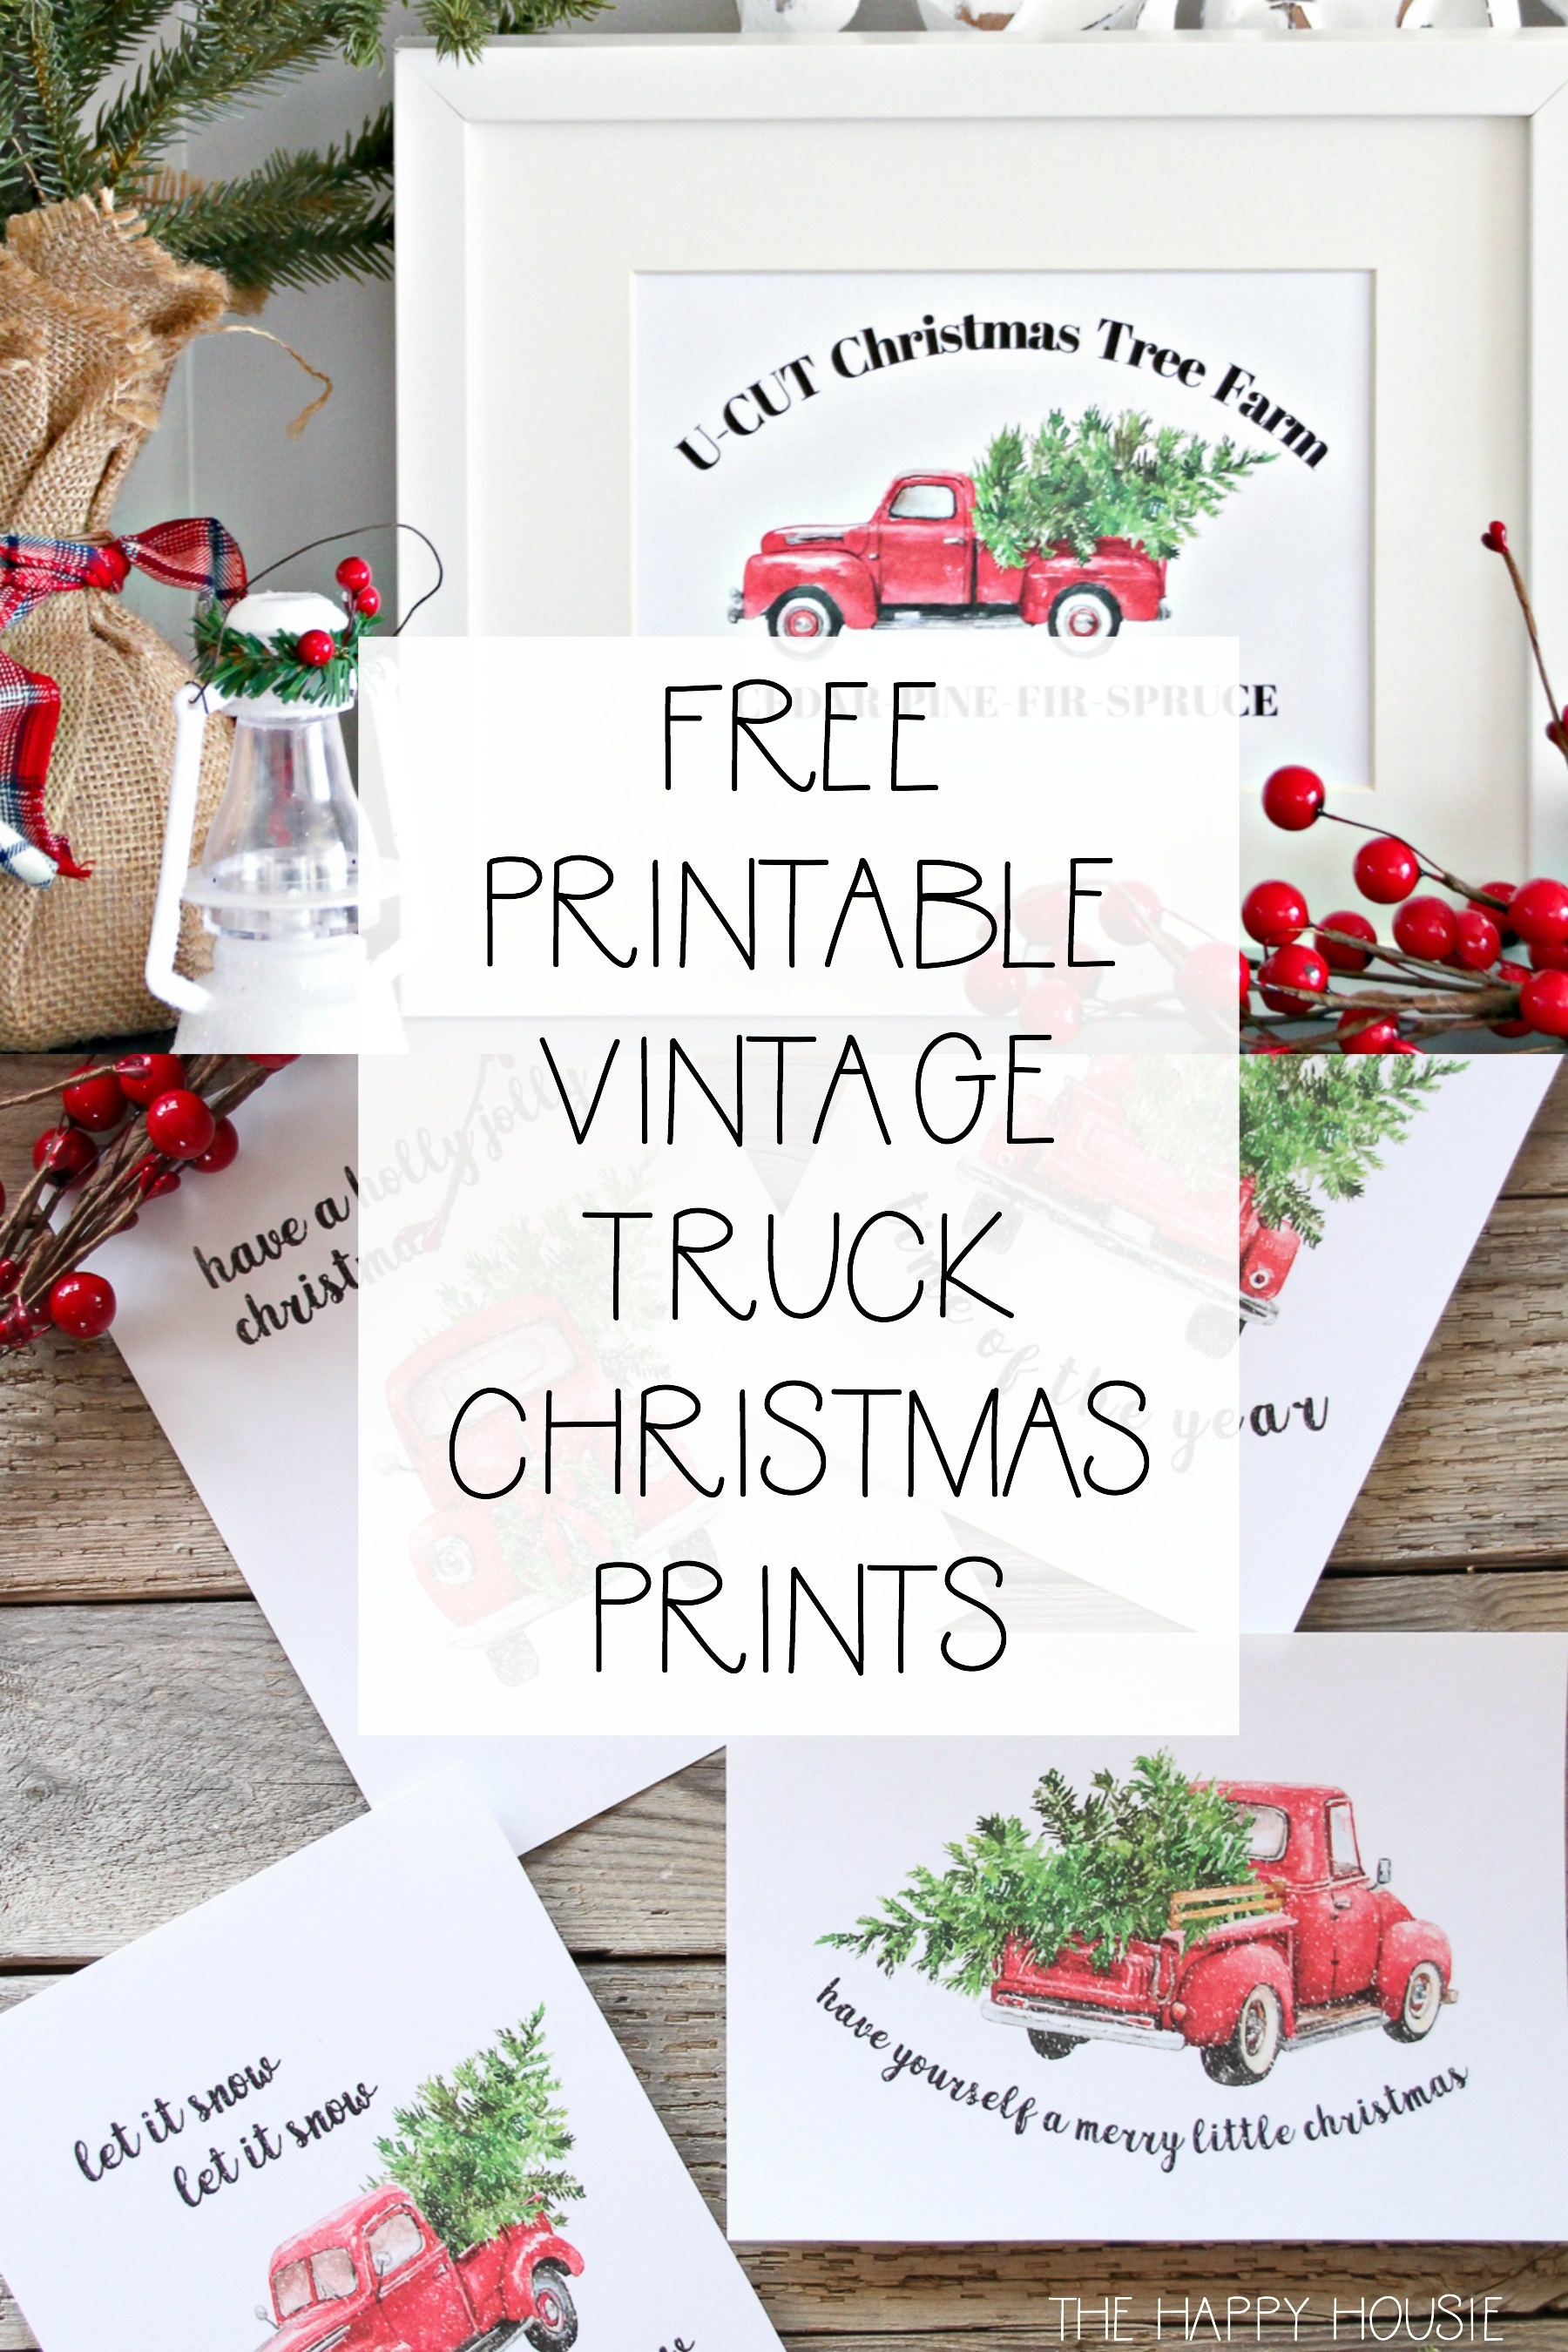 5 Free Vintage Truck Christmas Printables   The Happy Housie - Free Printable Vintage Christmas Pictures